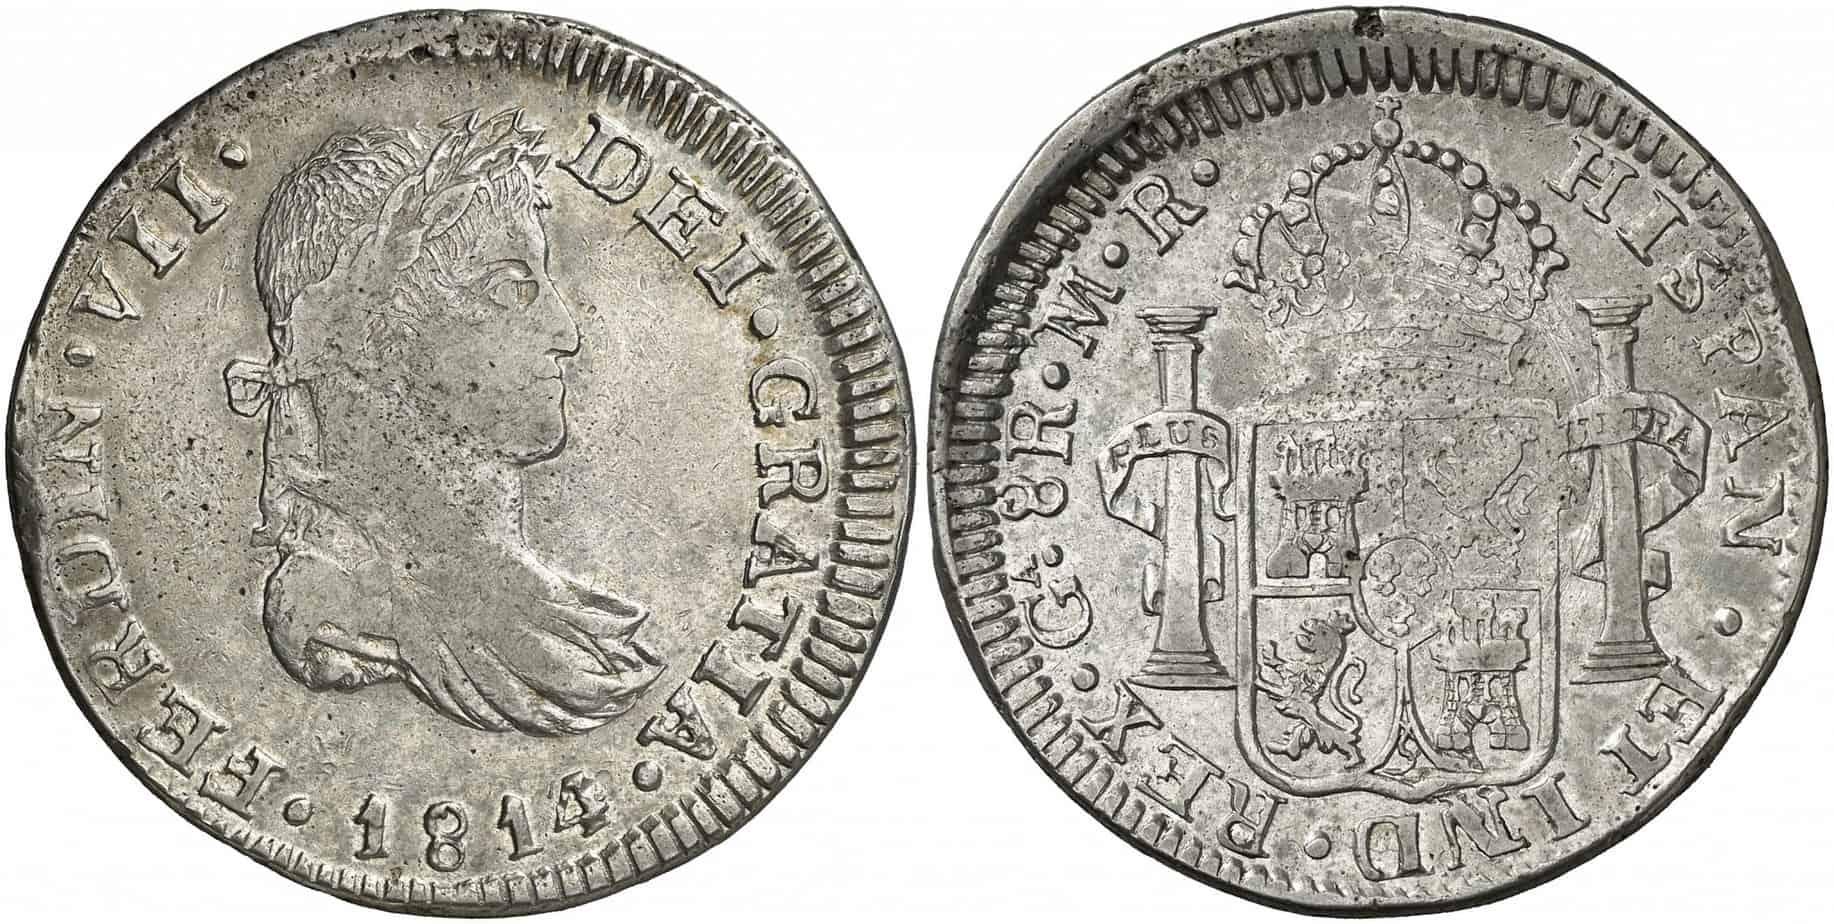 8 reales Guadelajara 1814